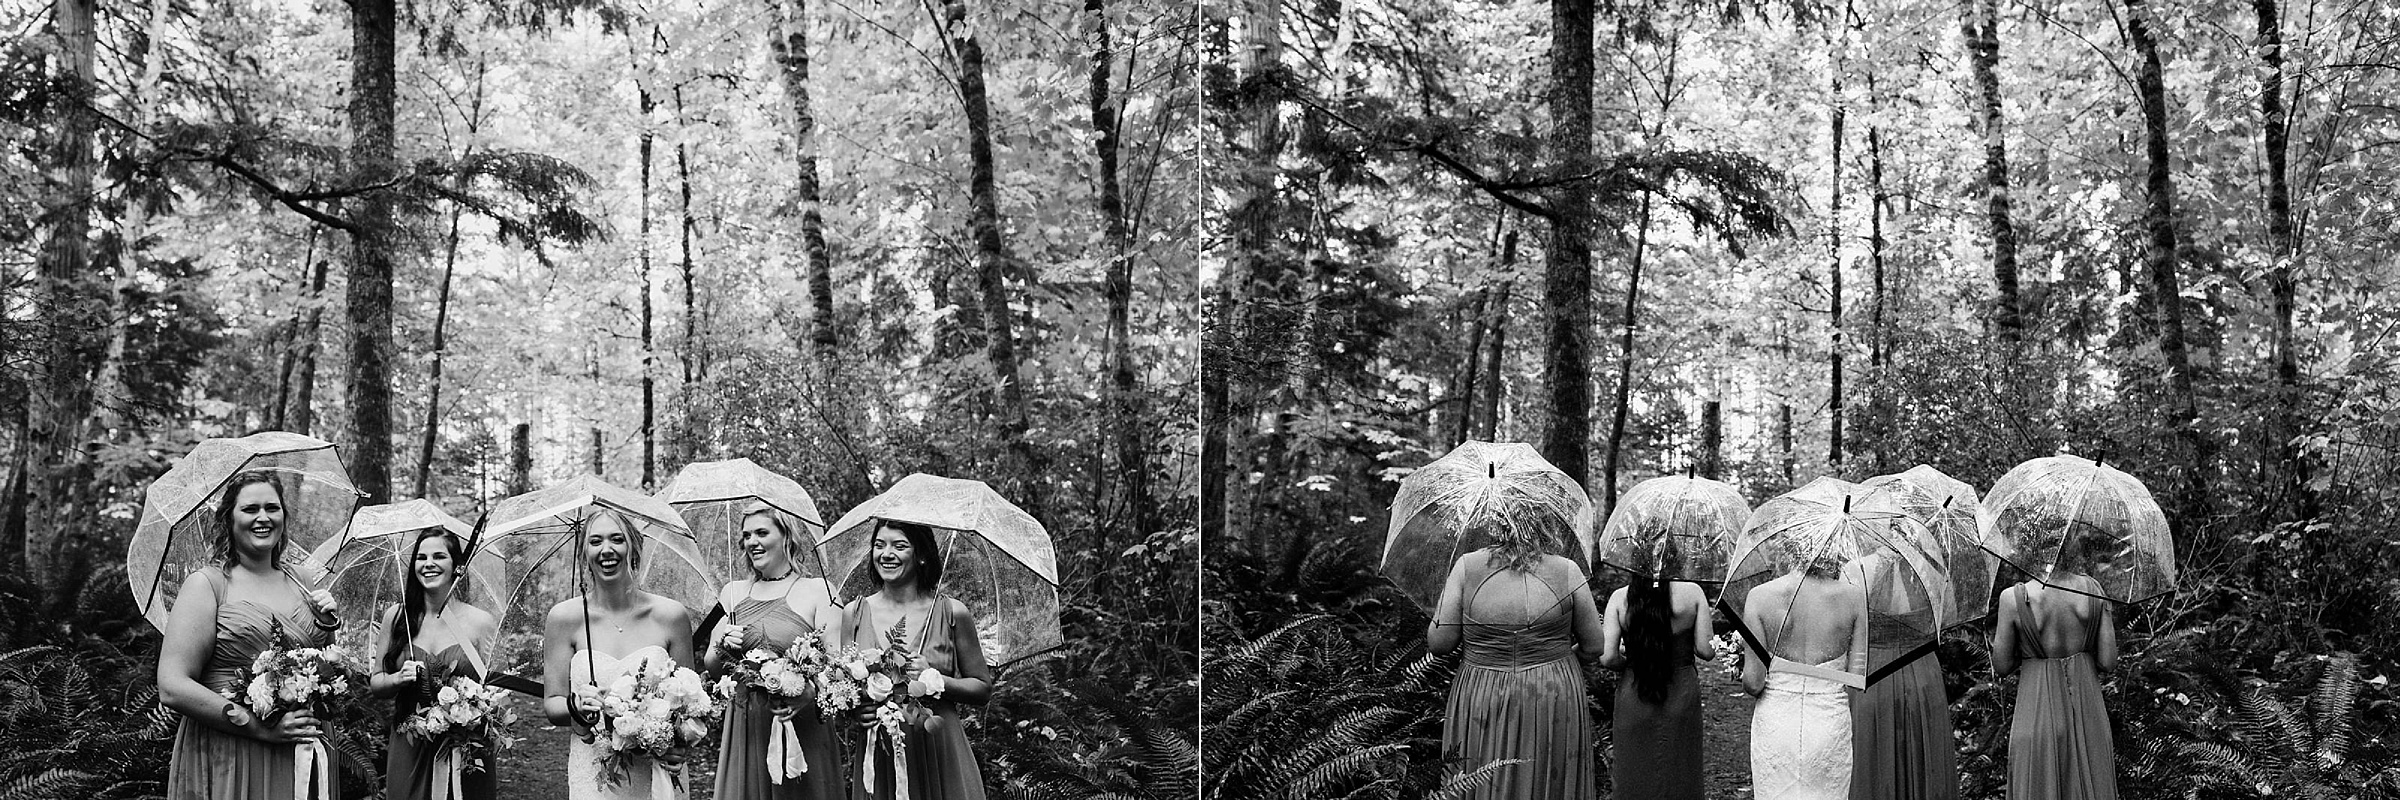 bridesmaids with umbrellas Miracle Beach Comox Wedding Photographer